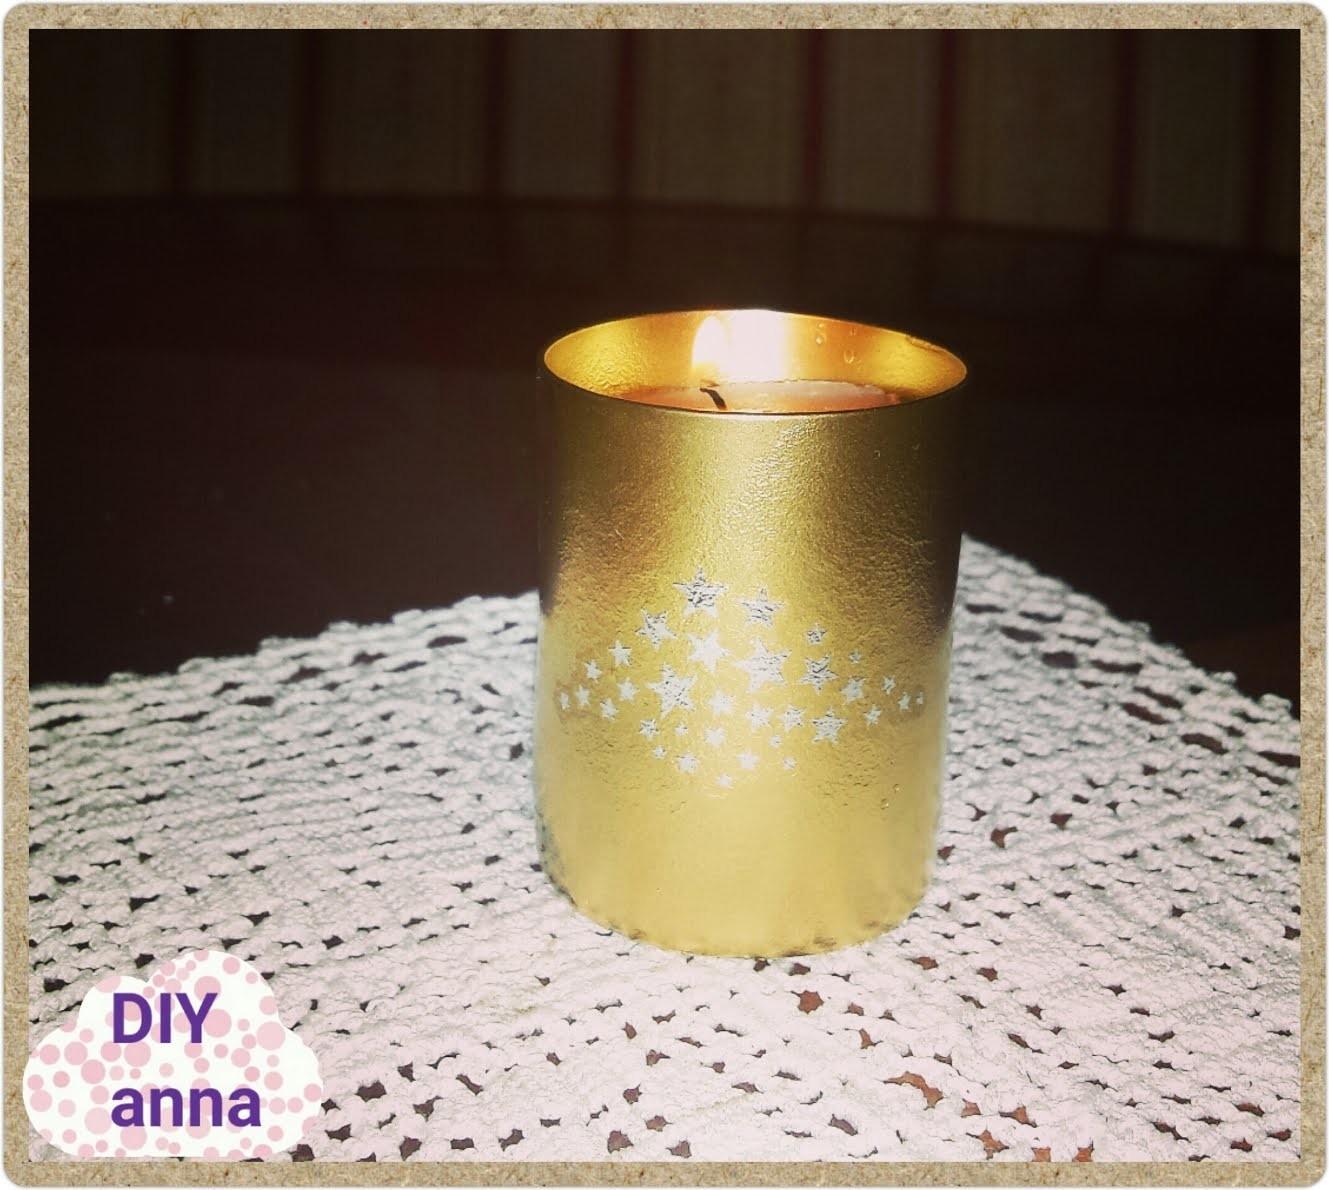 Gold spray glass candle holder DIY craft ideas tutorial. URADI SAM